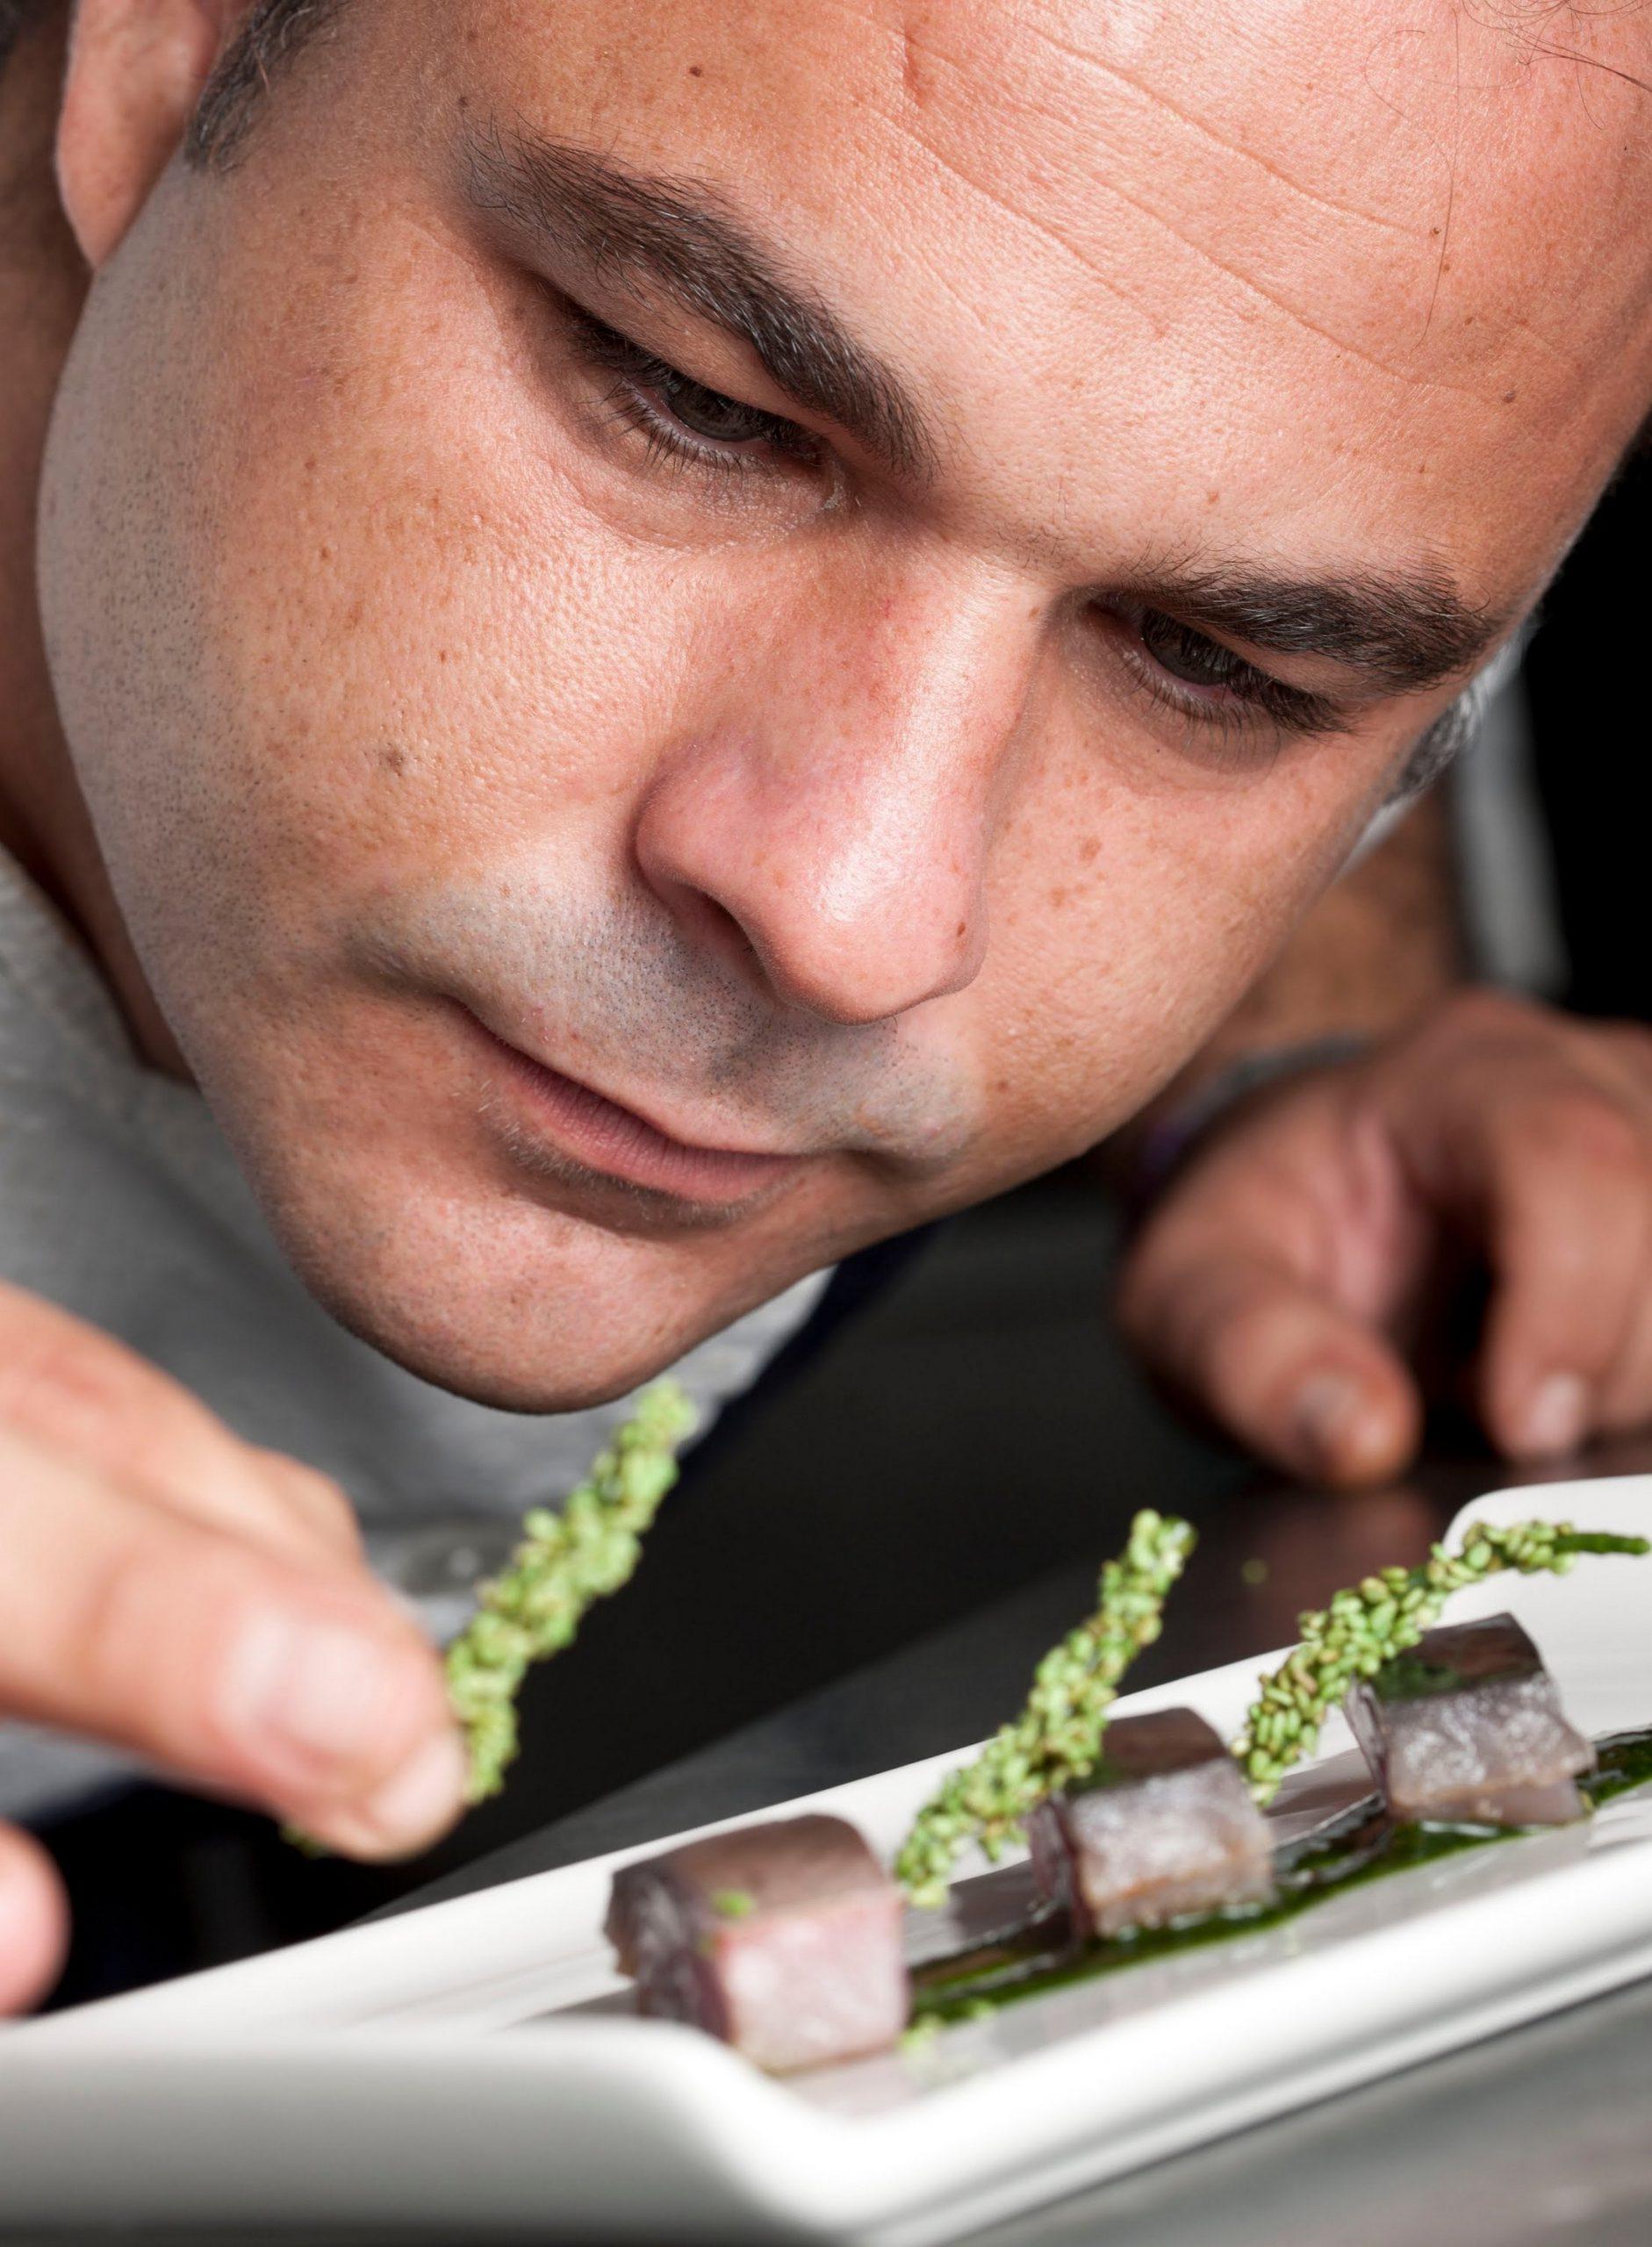 Ángel León Chef